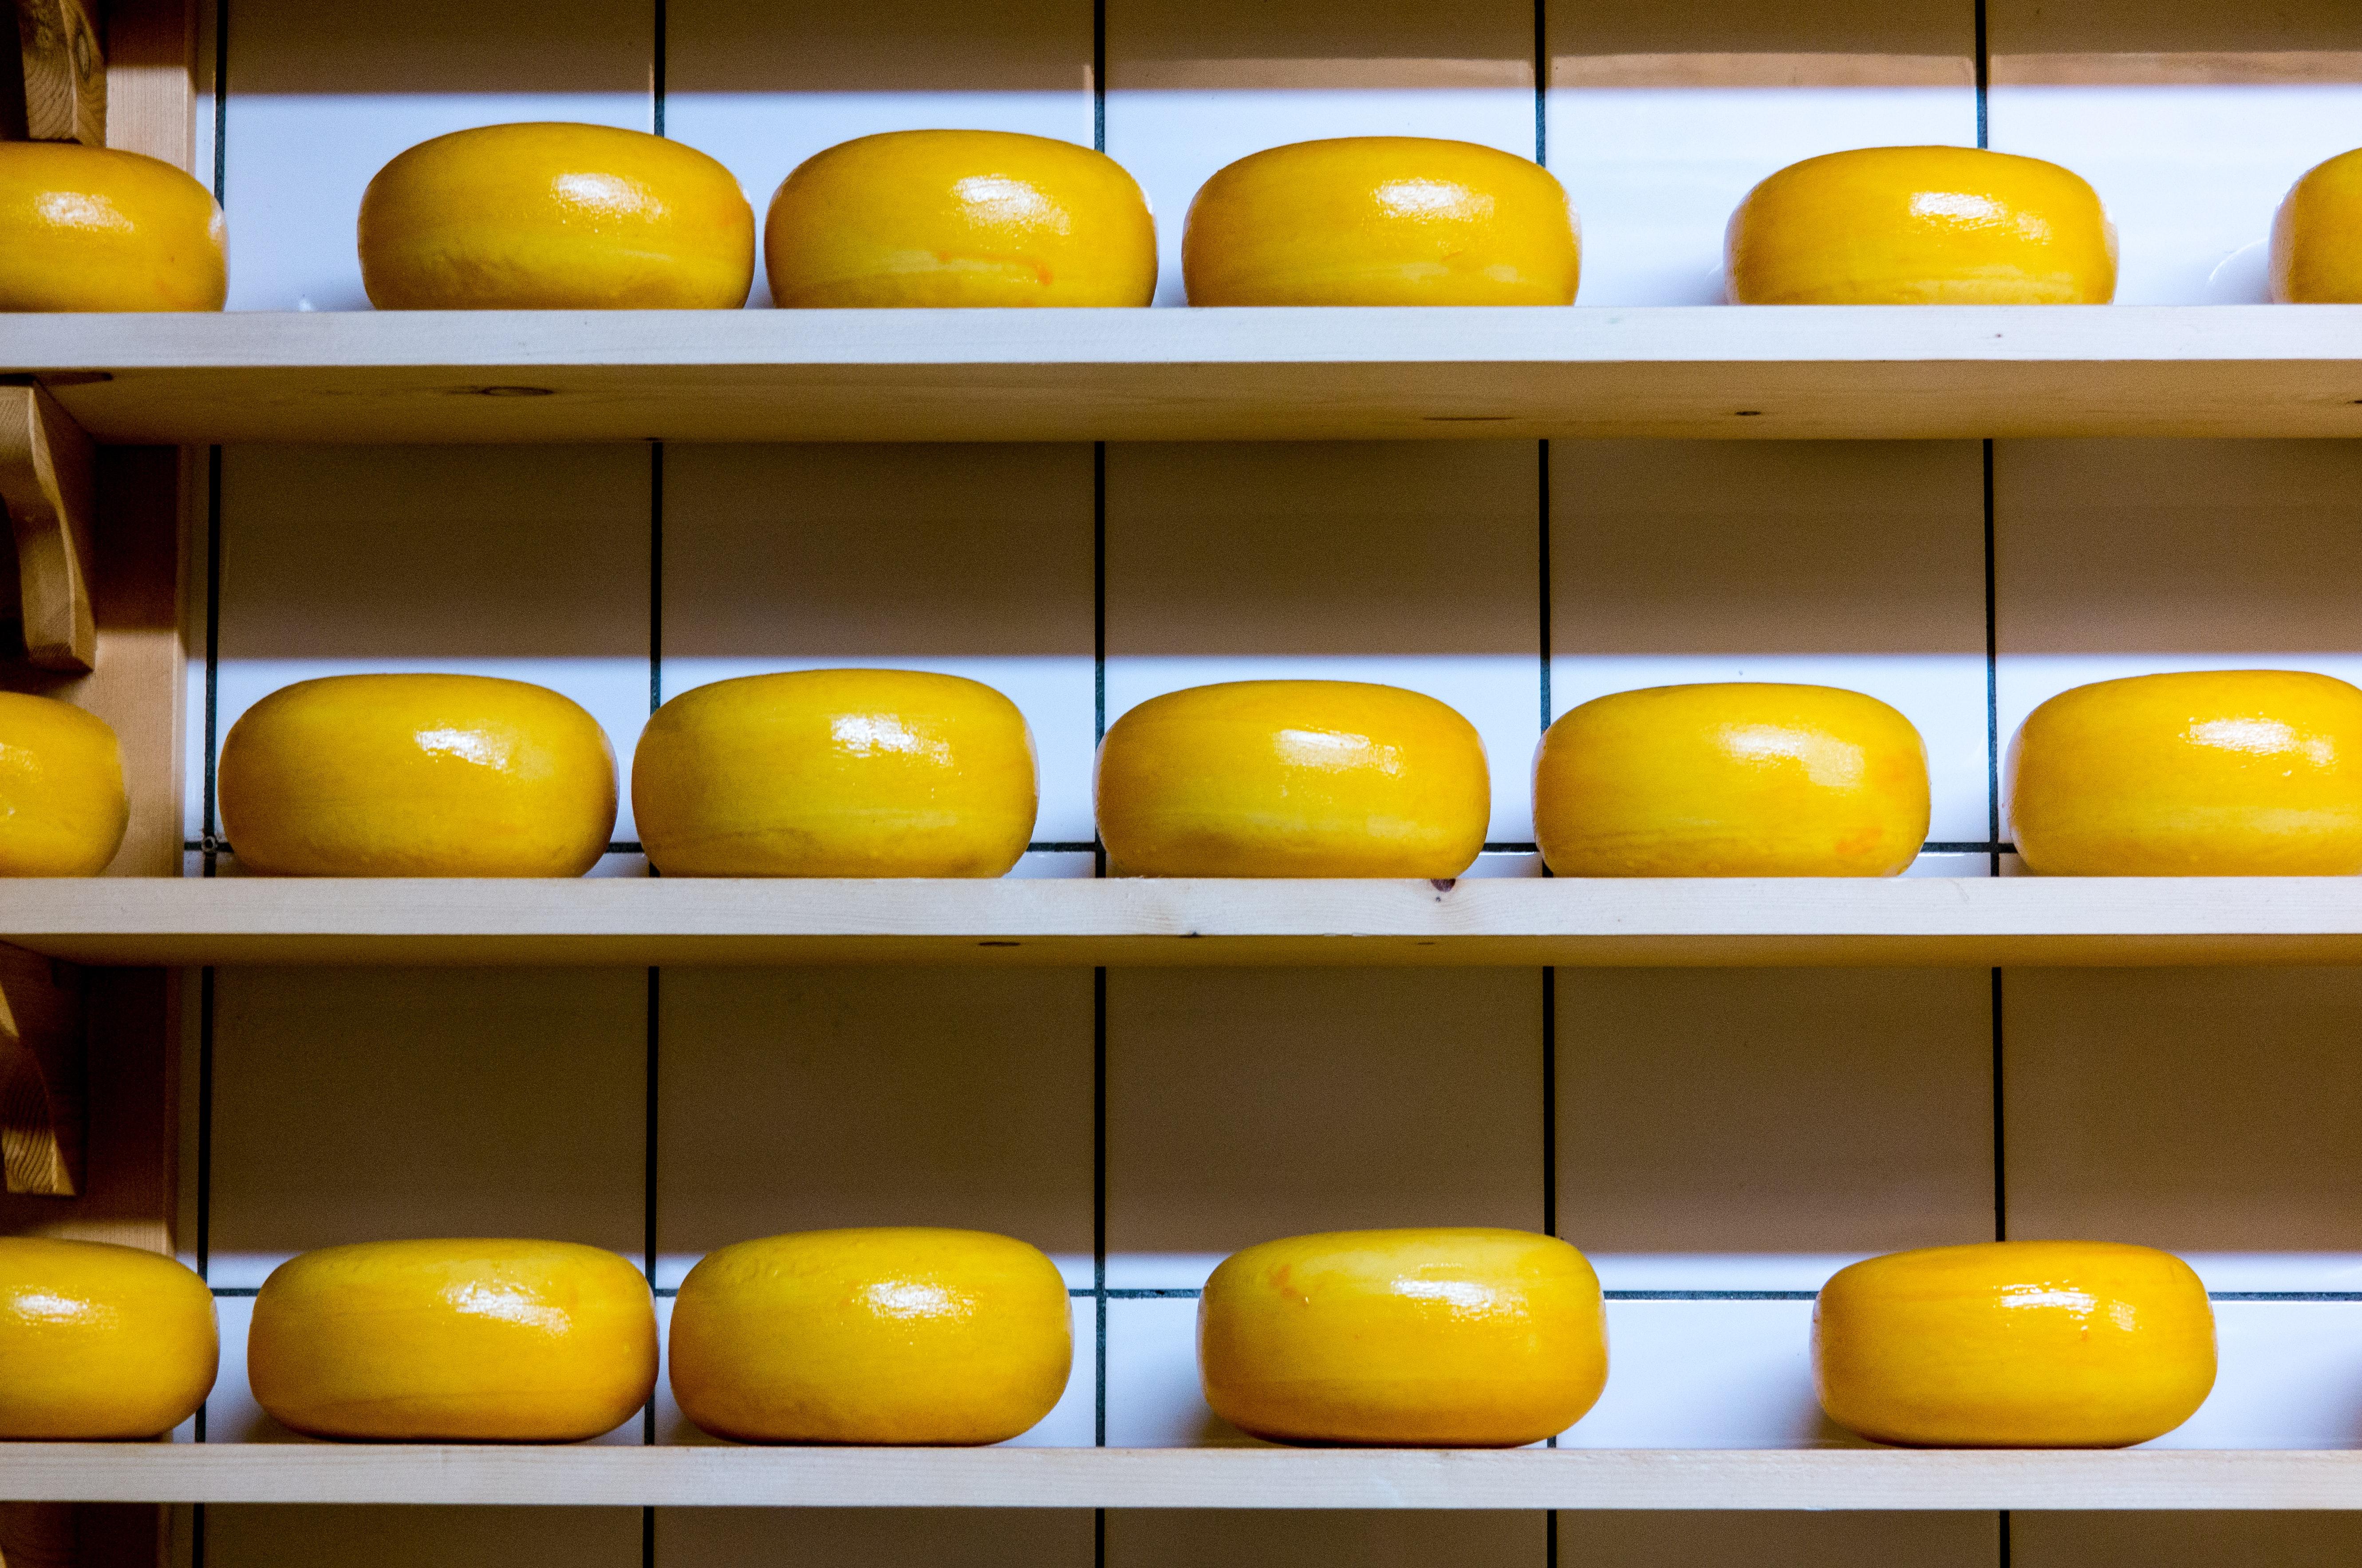 Appenzeller Cheese Appenzeller CheeseRemove term: Burgdorf Cheese cheese factory Cheese Route Cheese cheese-making Dinner Emmental experience term: Fondue FondueRemove term: Fondue hike Fondue hikeRemove fondueland Gruyère La Maison du Gruyère museum Pringy-Gruyères Pringy-Gruyères Raclette St Gallen Switzerland